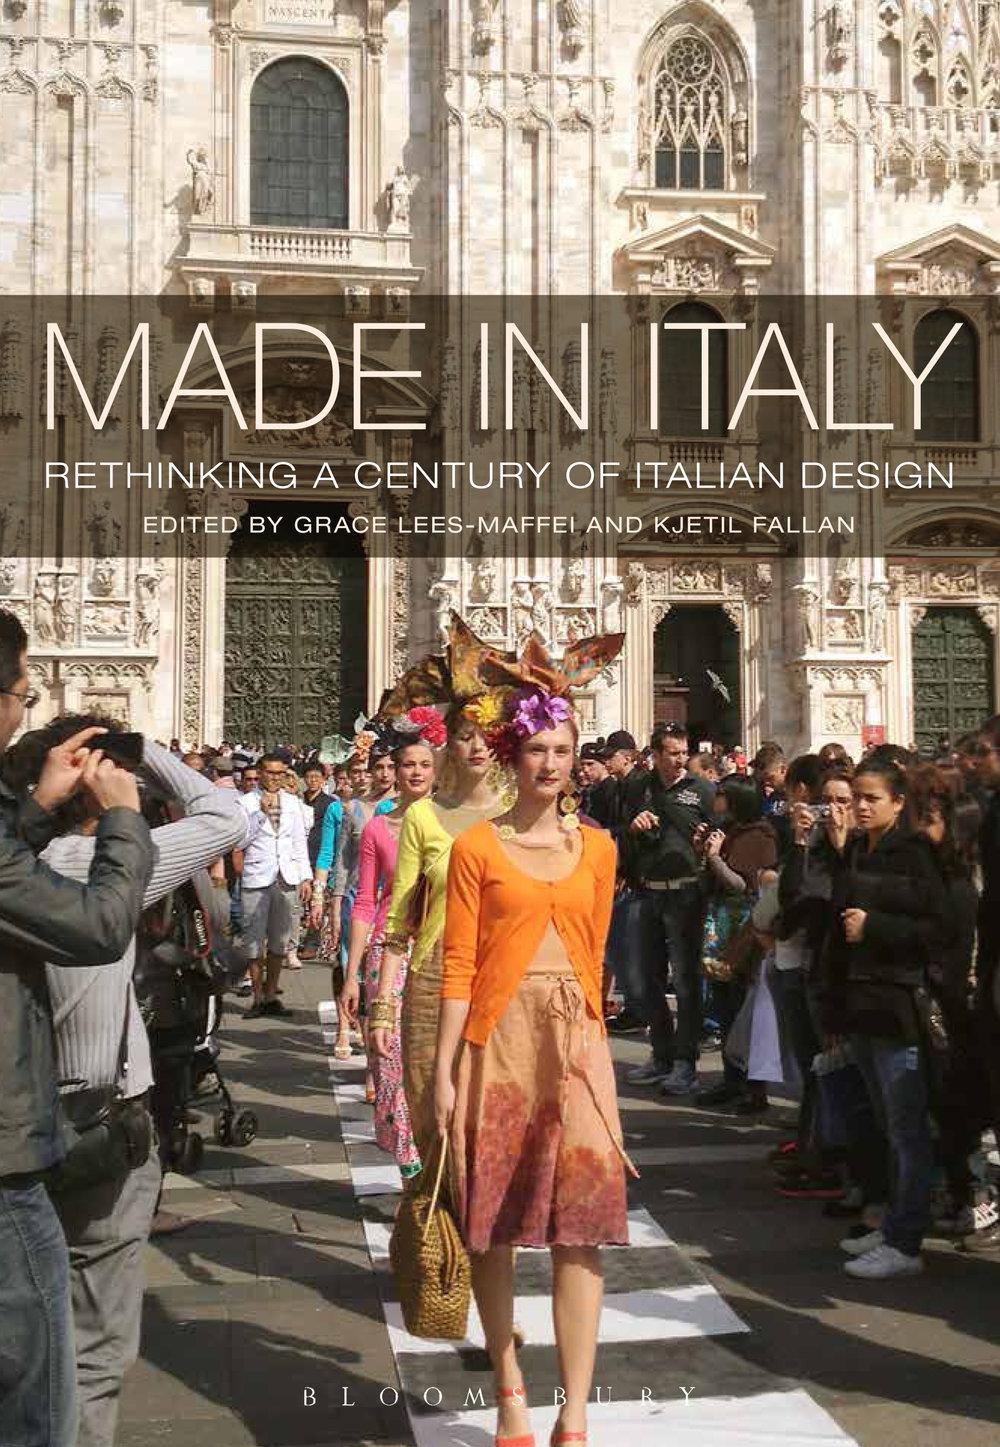 Lees-Maffei, G. & K. Fallan, eds.   Made in Italy: Rethinking a Century of Italian Design     (London: Bloomsbury Academic, 2014).